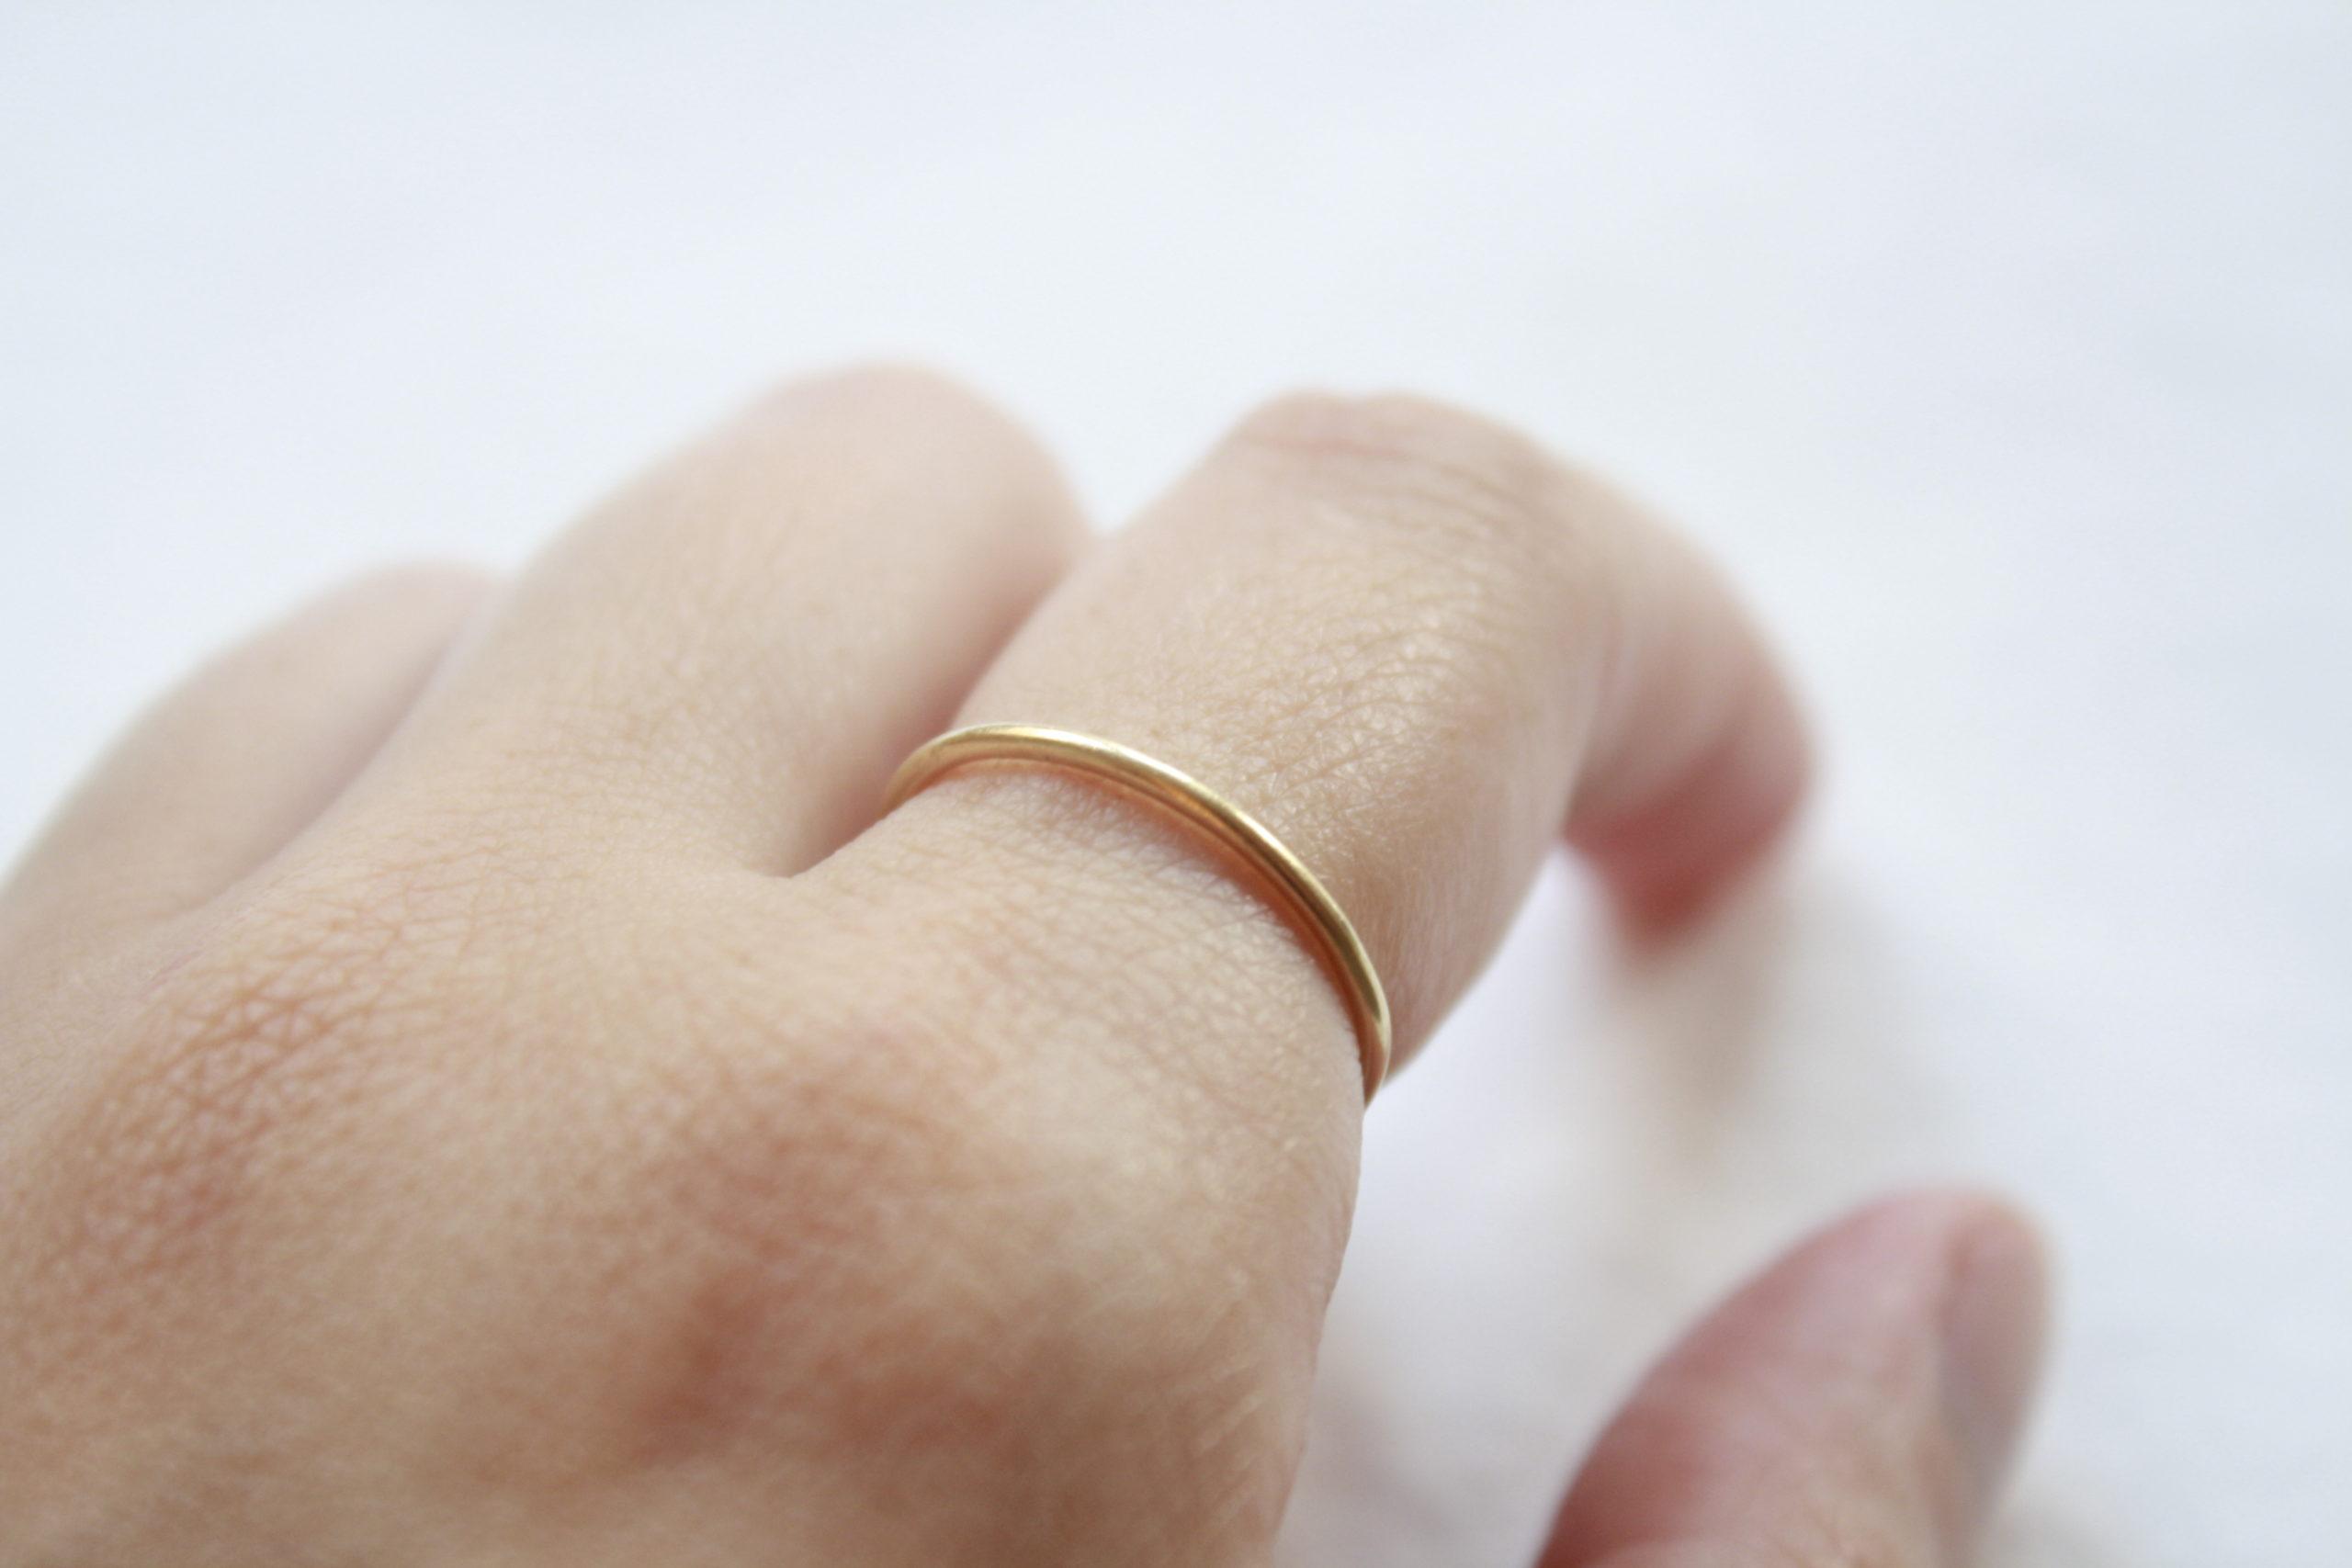 Anillo simple y elegante fino de oro 18k